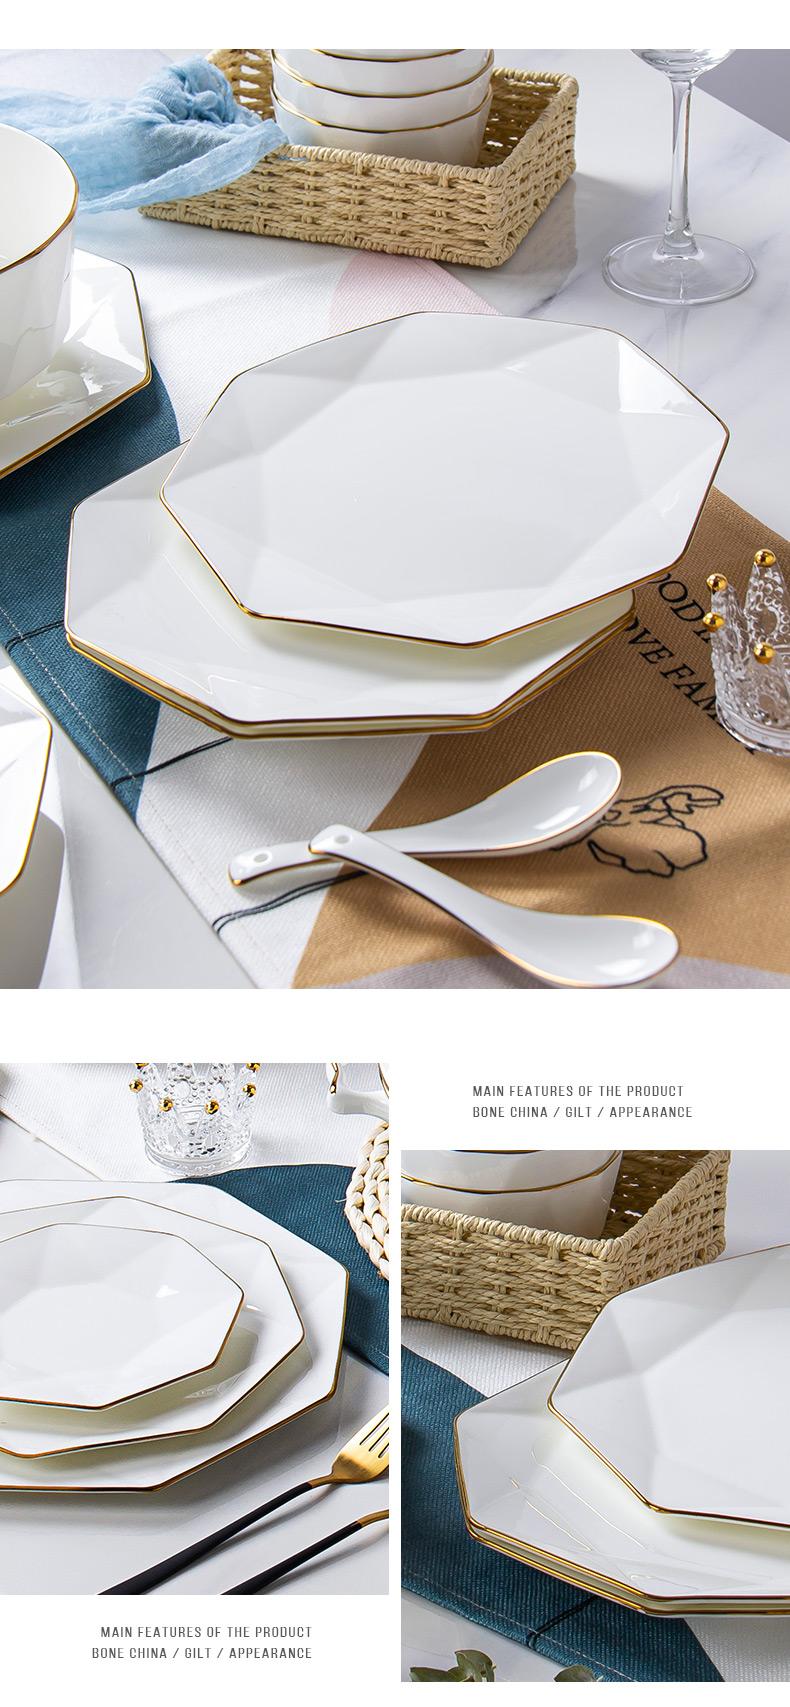 Up Phnom penh Nordic creative web celebrity light excessive ipads porcelain tableware ceramics steak plates ins dinner plate household 0